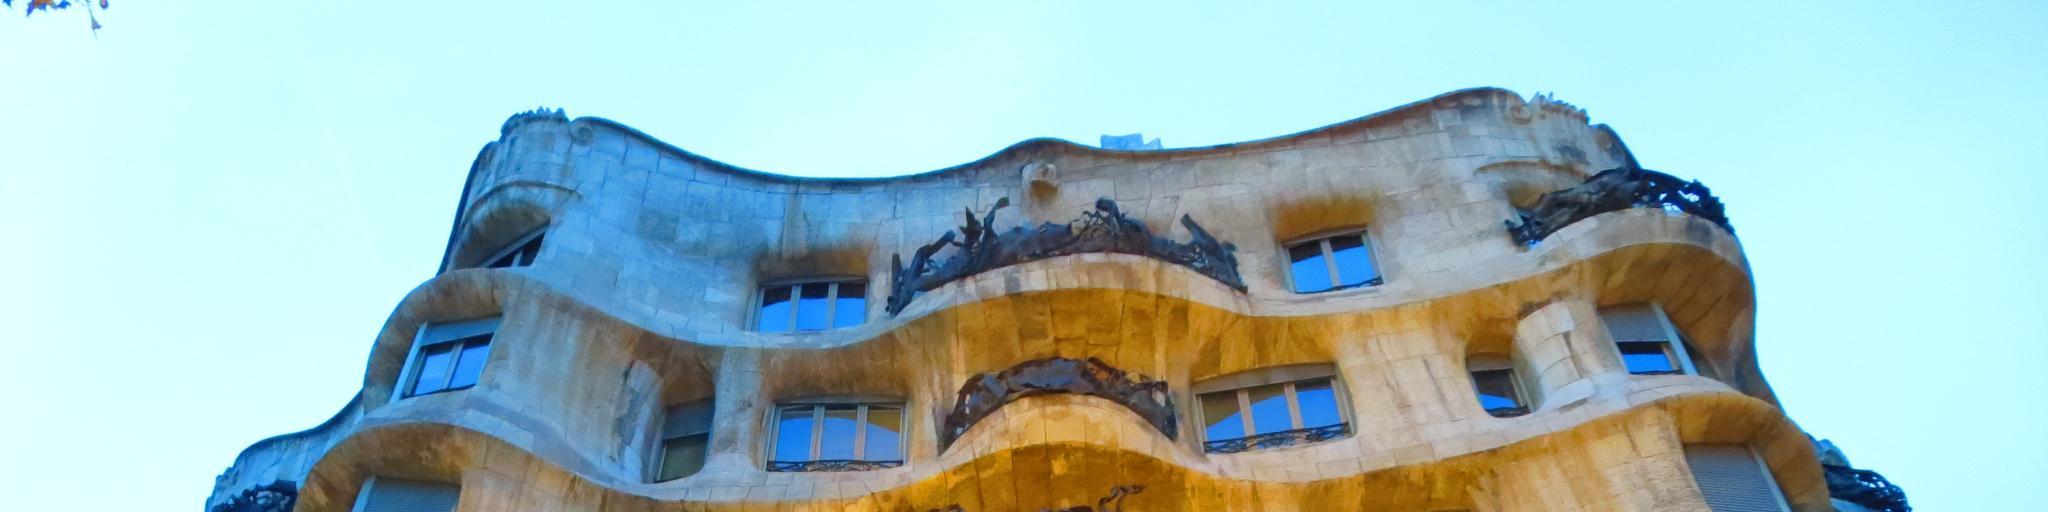 The wavy exterior walls of Casa Mila (aka La Pedrera), an apartment building in Barcelona designed by Gaudi